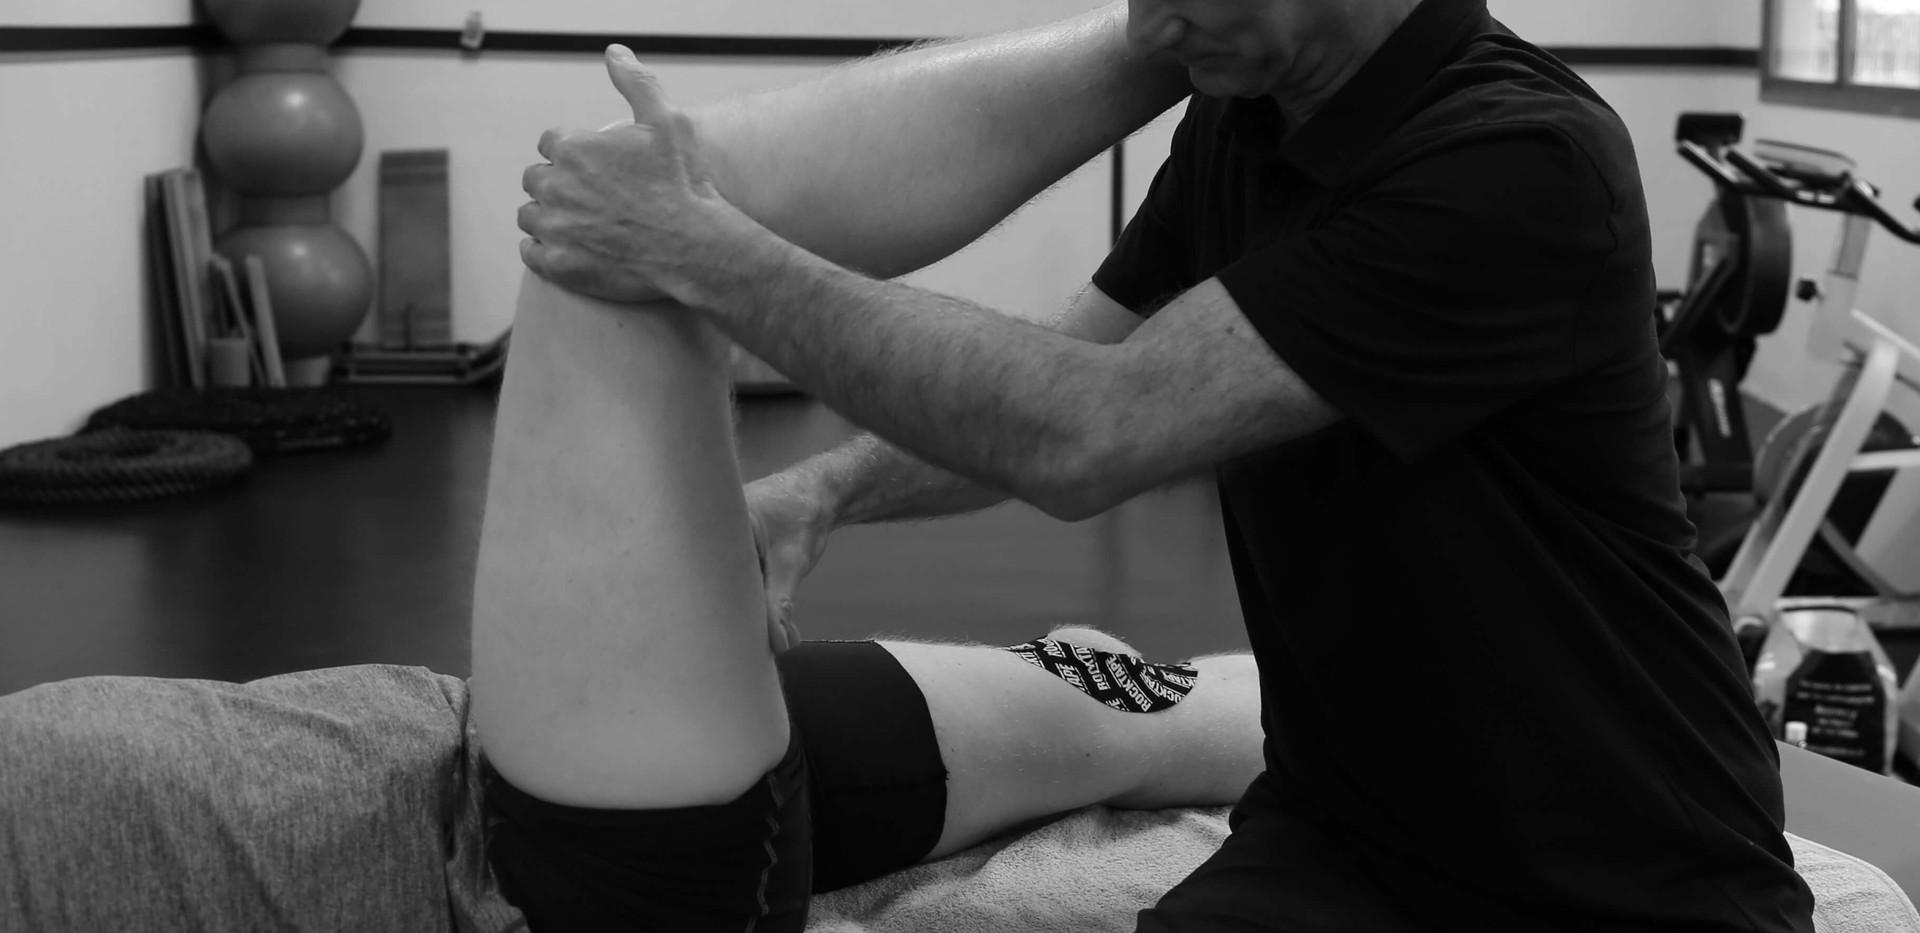 Relachement_musculaire_gymnase_massage_r